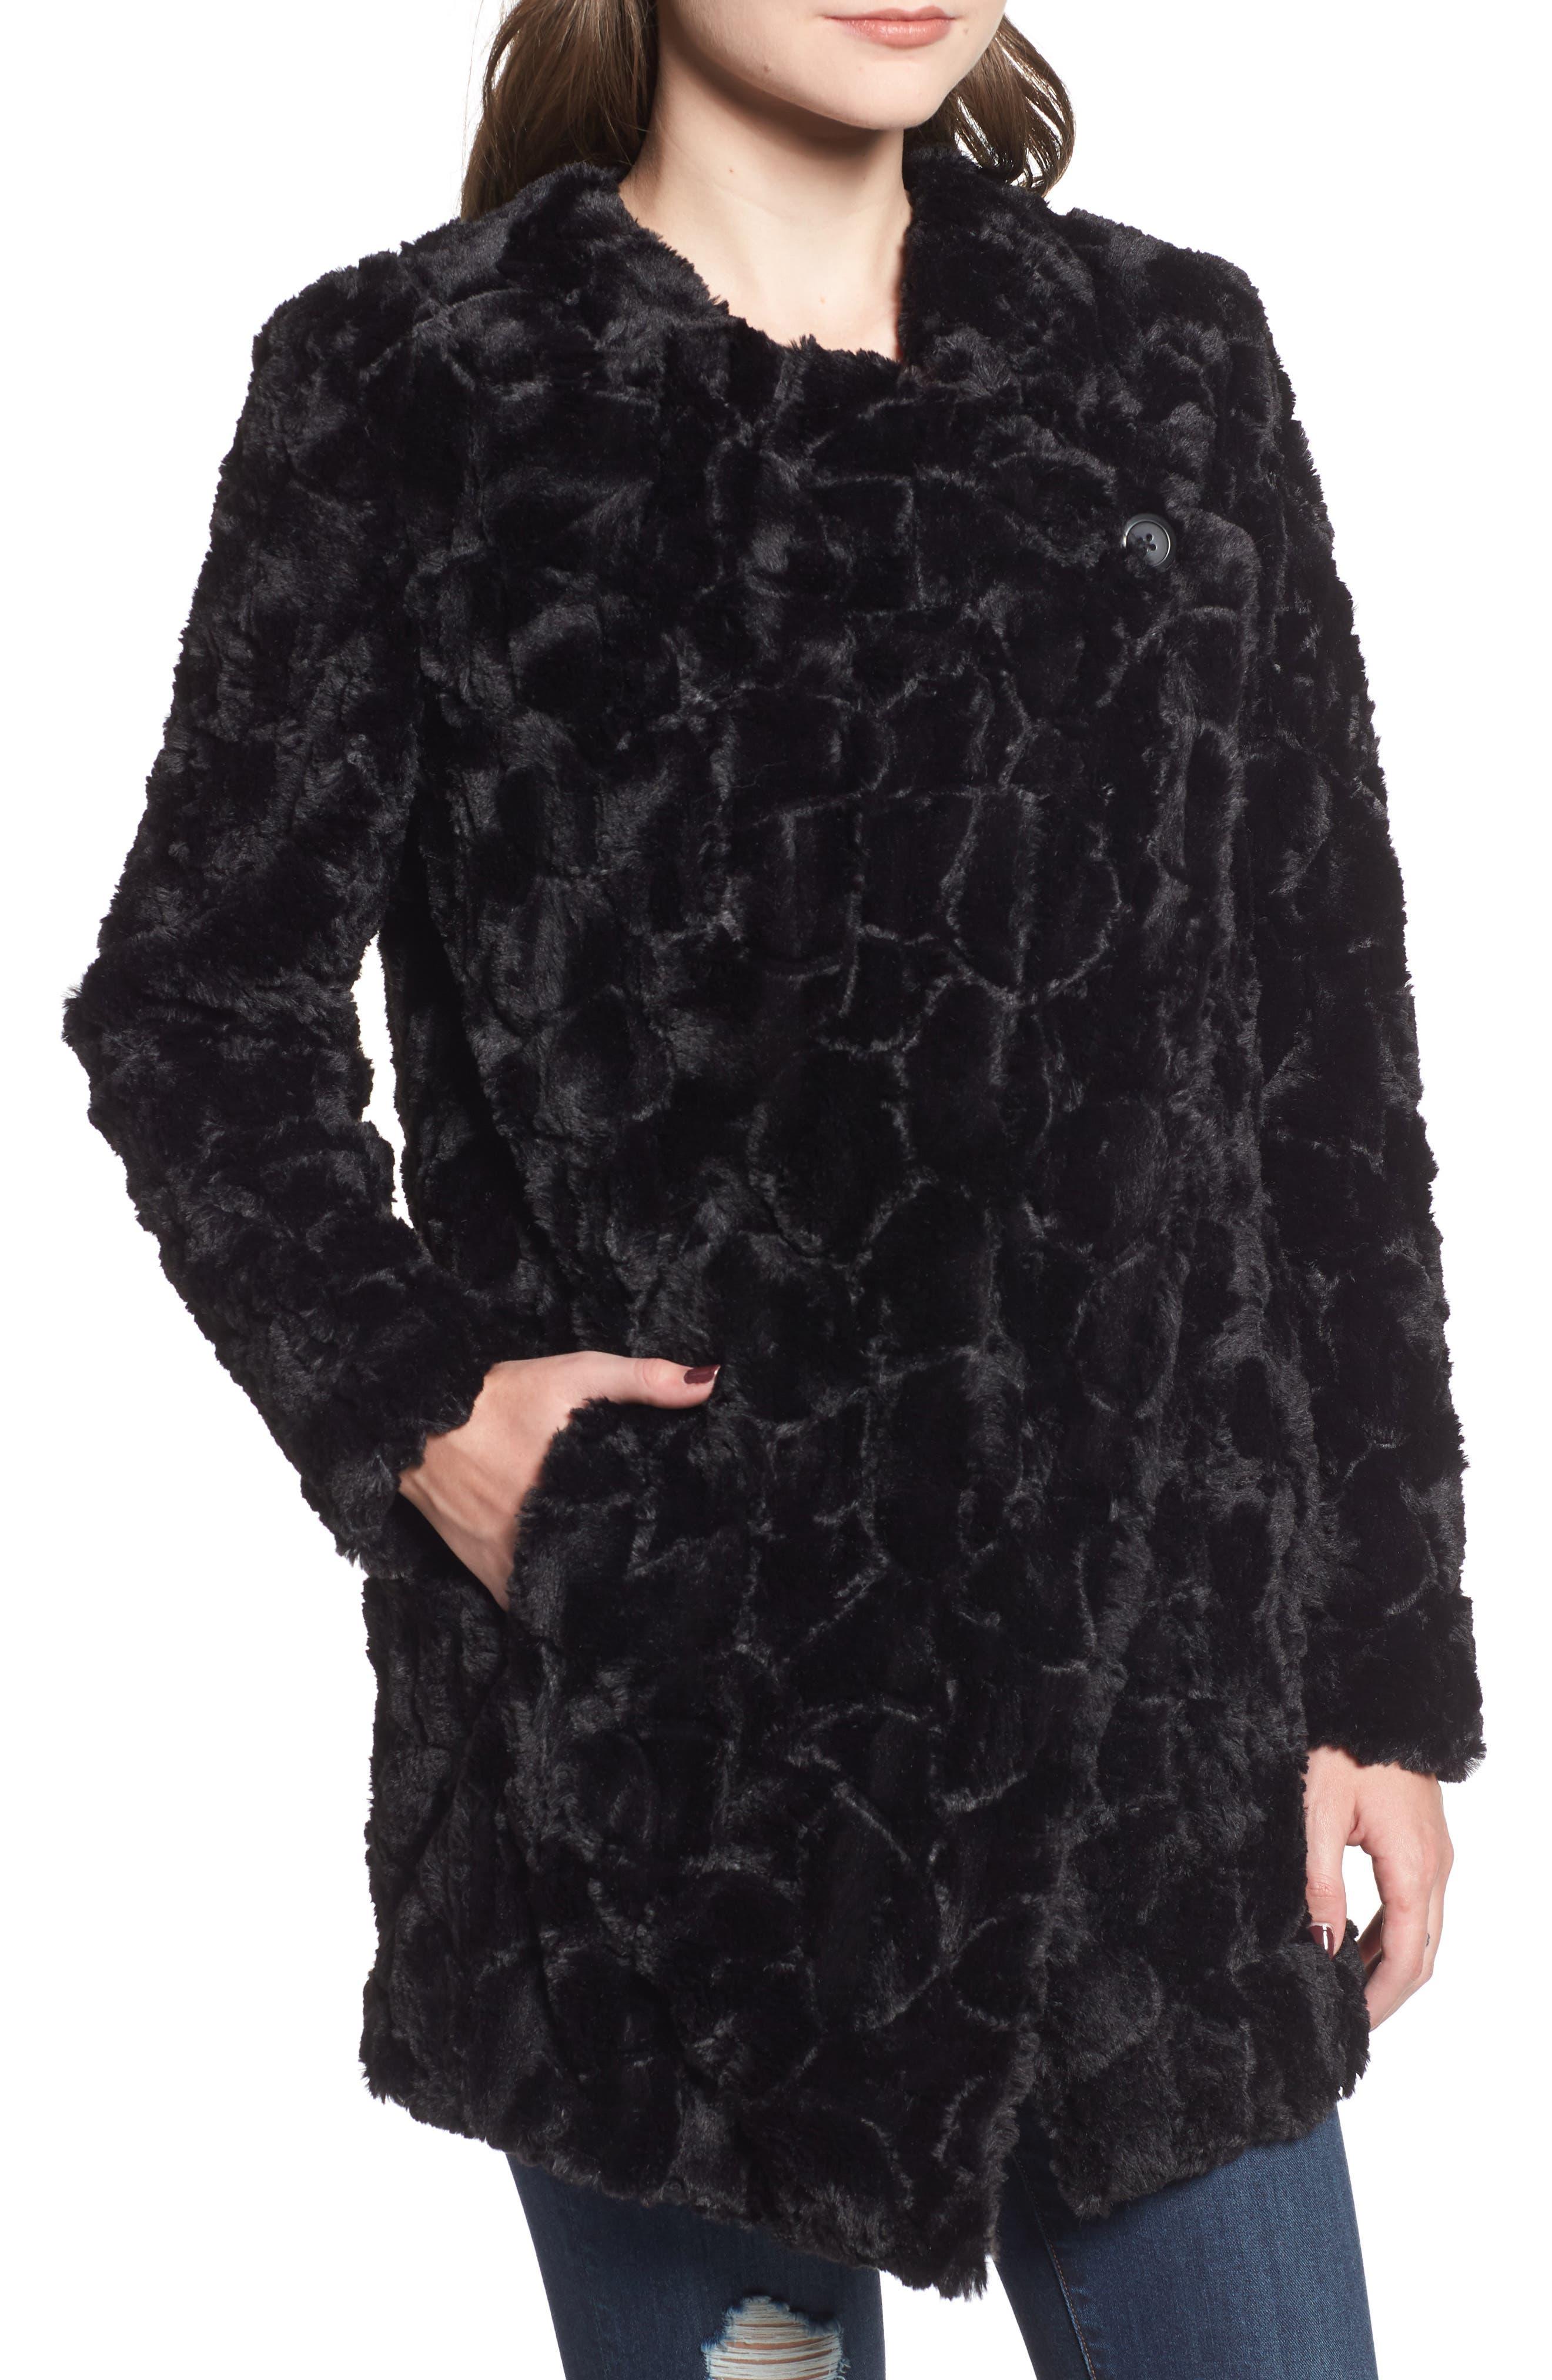 Tucker Wubby Faux Fur Coat,                             Alternate thumbnail 4, color,                             001